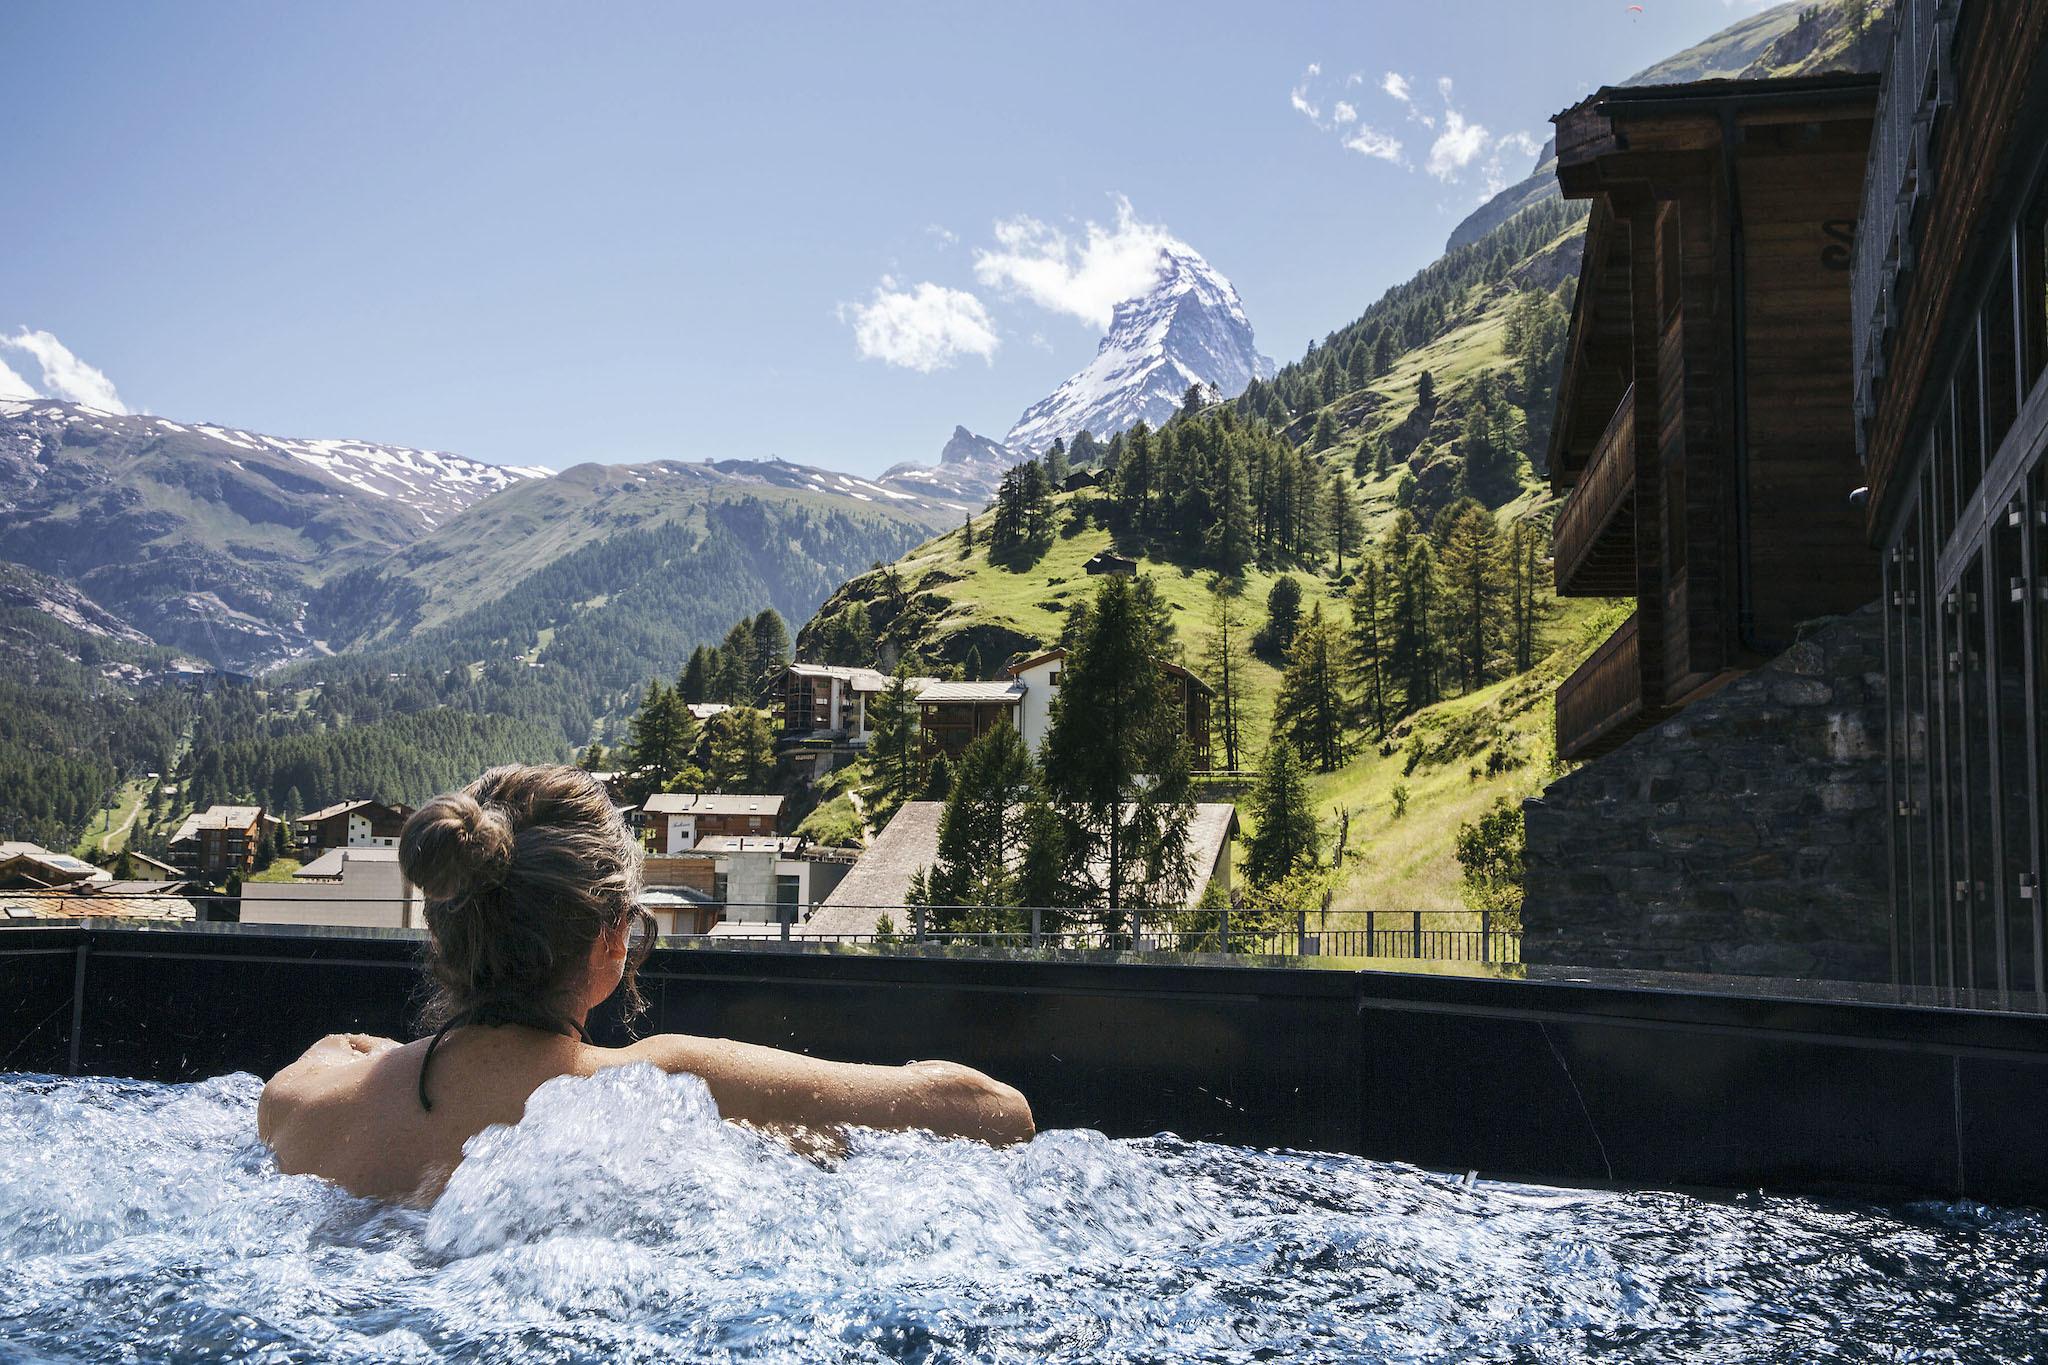 The Omnia outdoor whirlpool bath